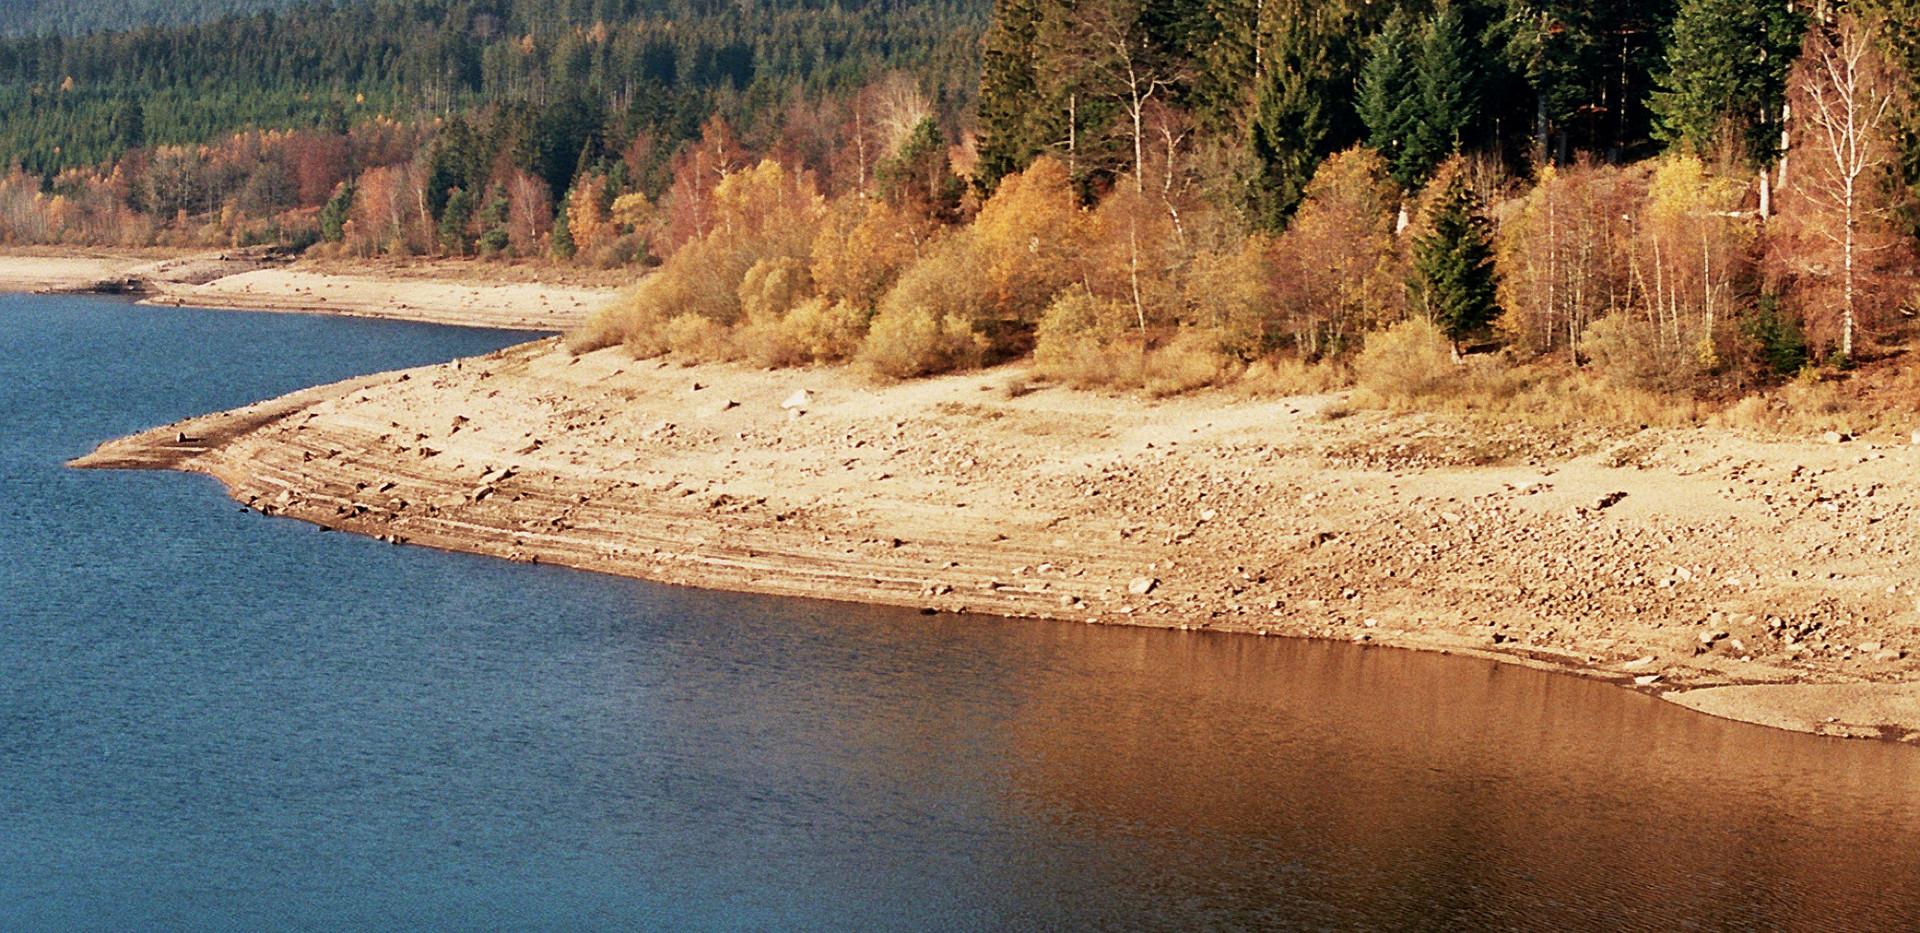 Schwarzenbach Dam, Germany, November 2018